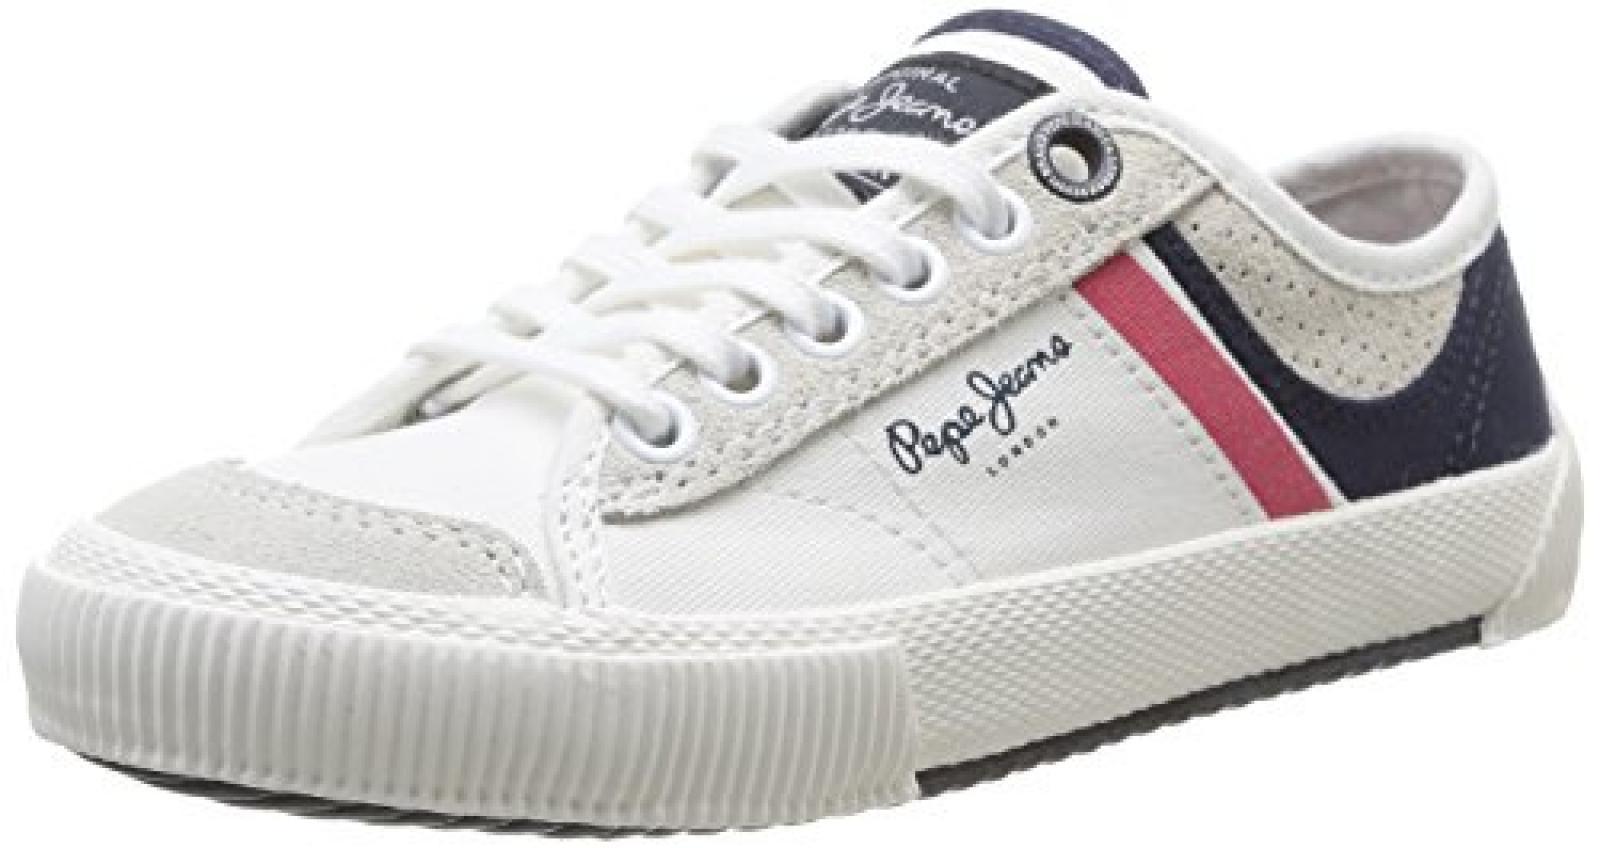 Pepe Jeans London GARETH TENNIS Jungen Sneakers